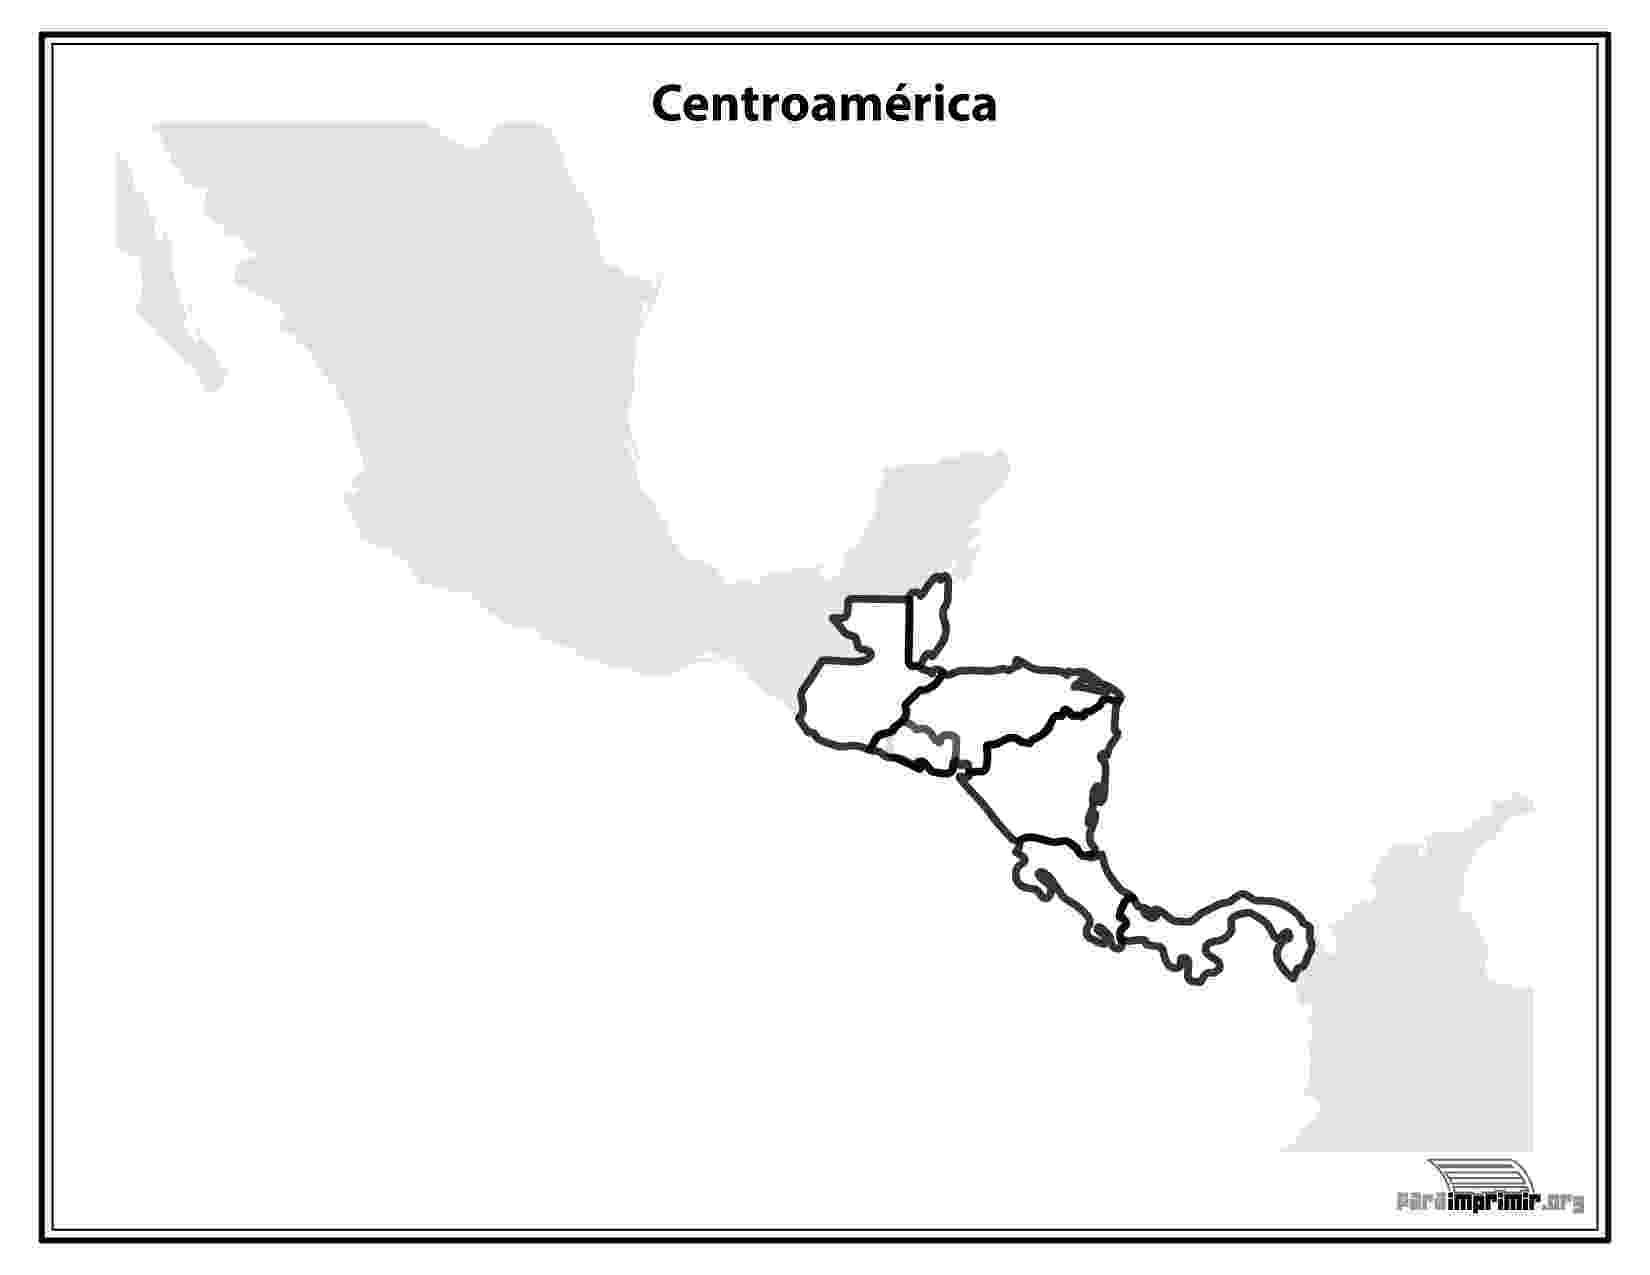 mapa de centroamerica mapa mudo centroamerica de centroamerica mapa